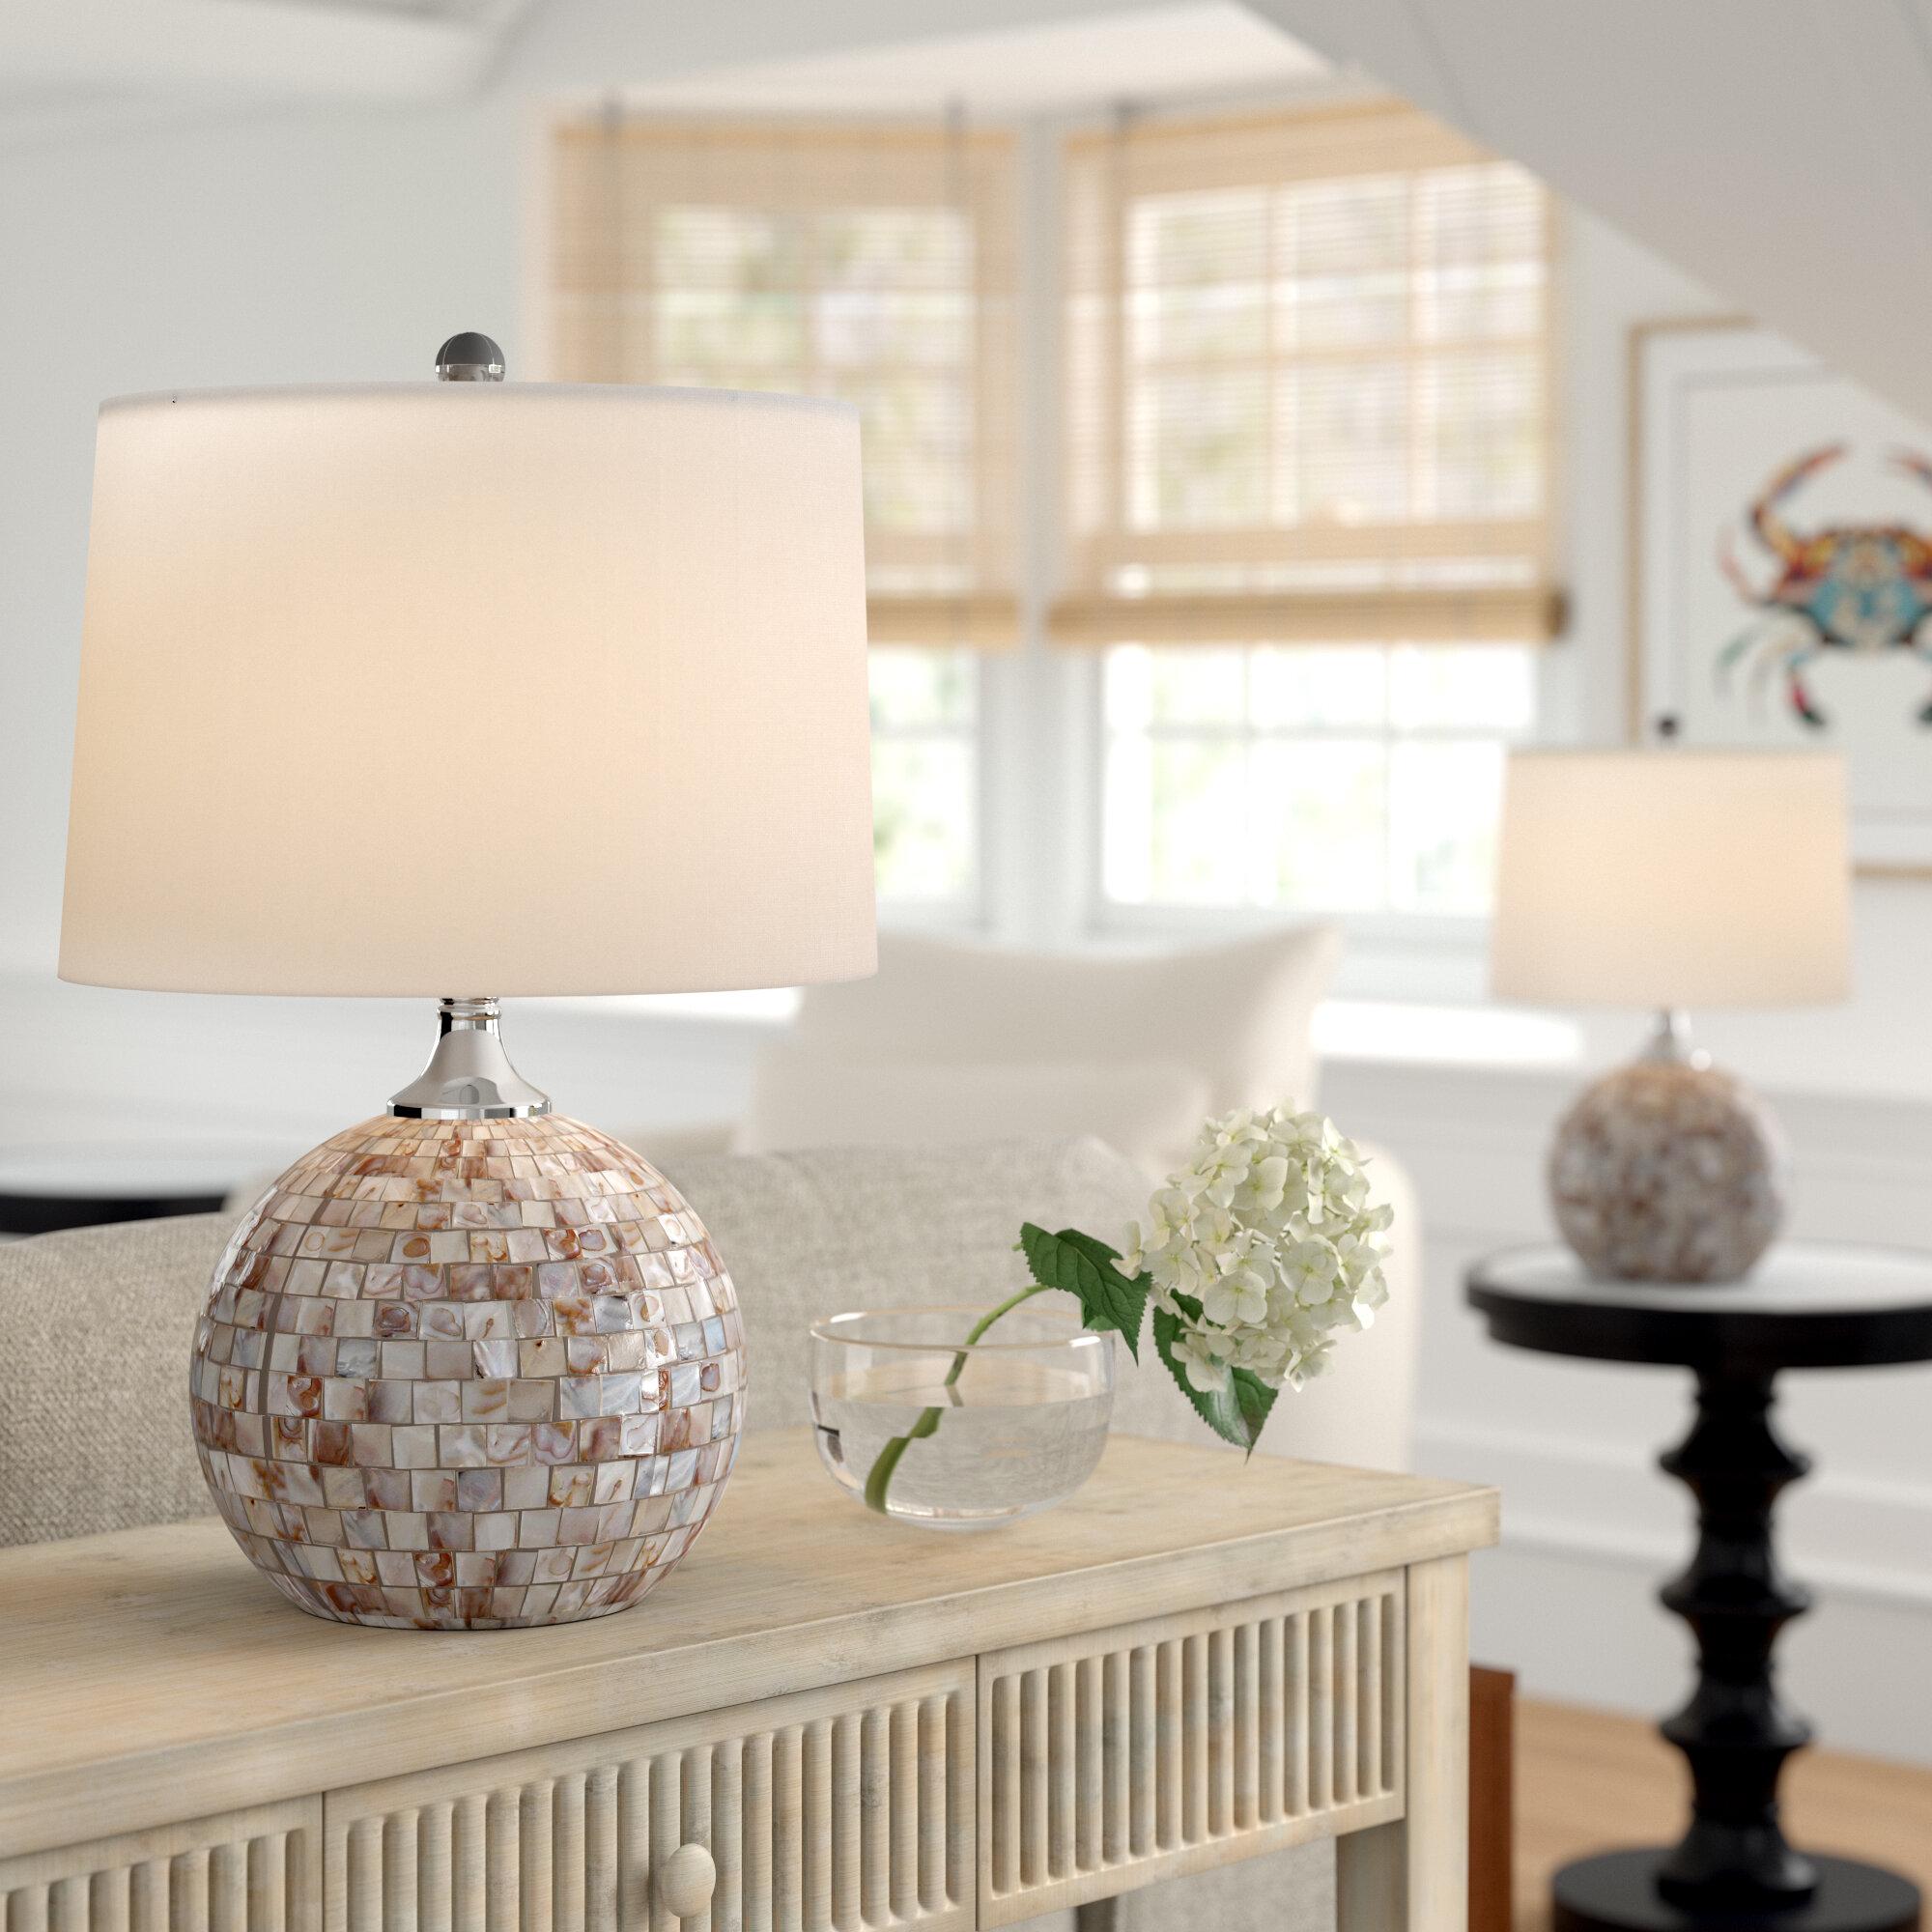 Highland dunes tazewell shell 21 5 table lamp reviews wayfair